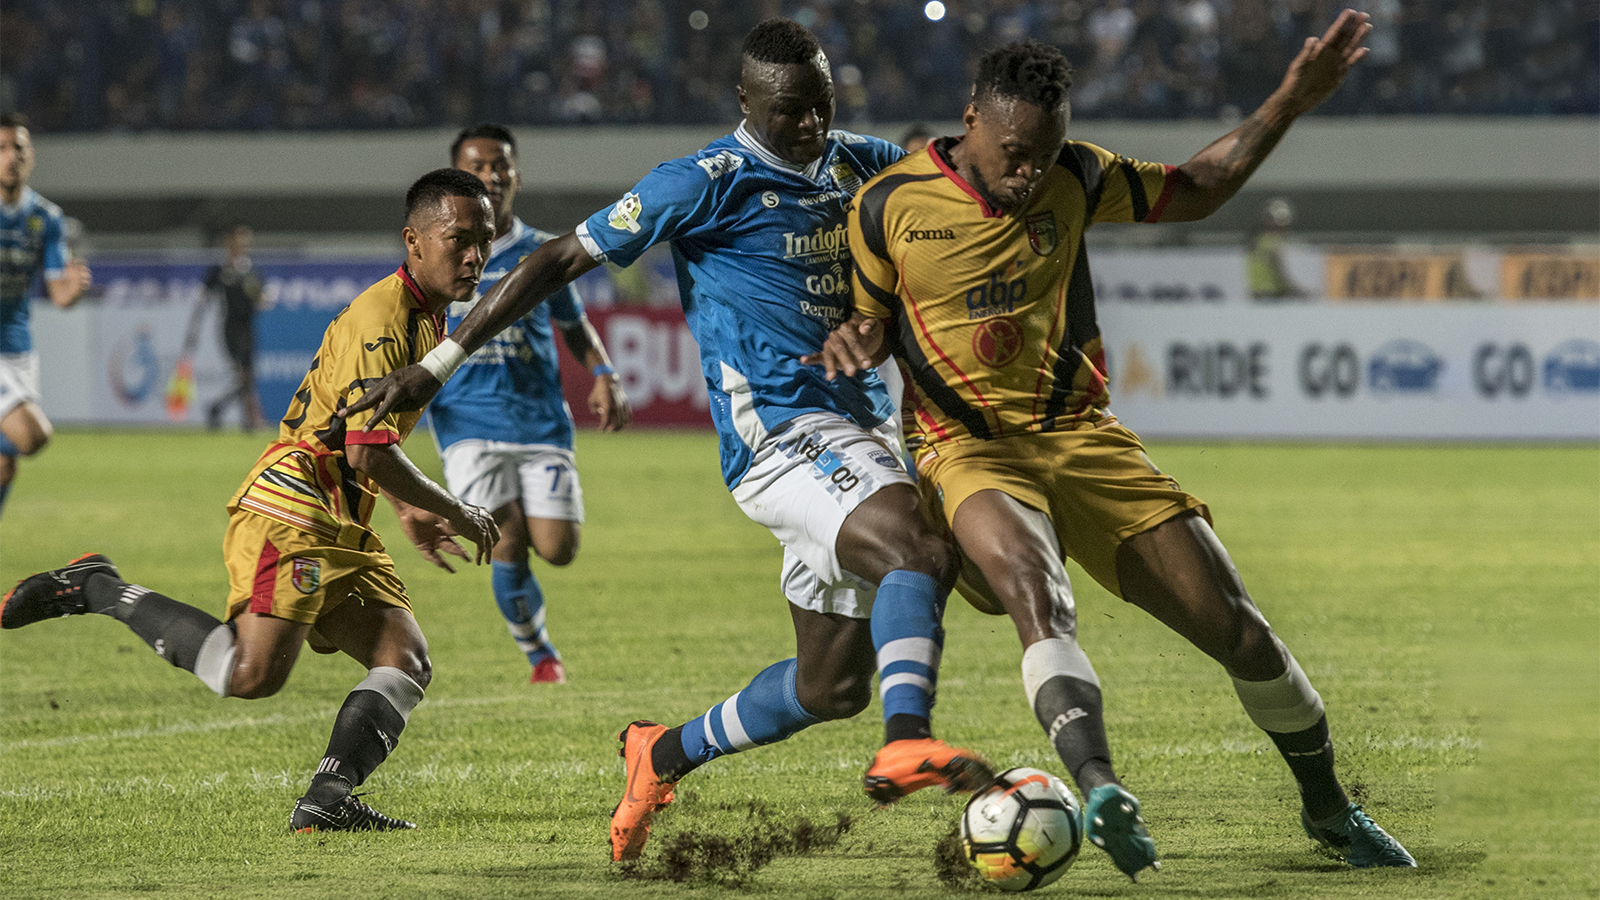 Madura United Vs Persib Kick Up A Soccer Ball